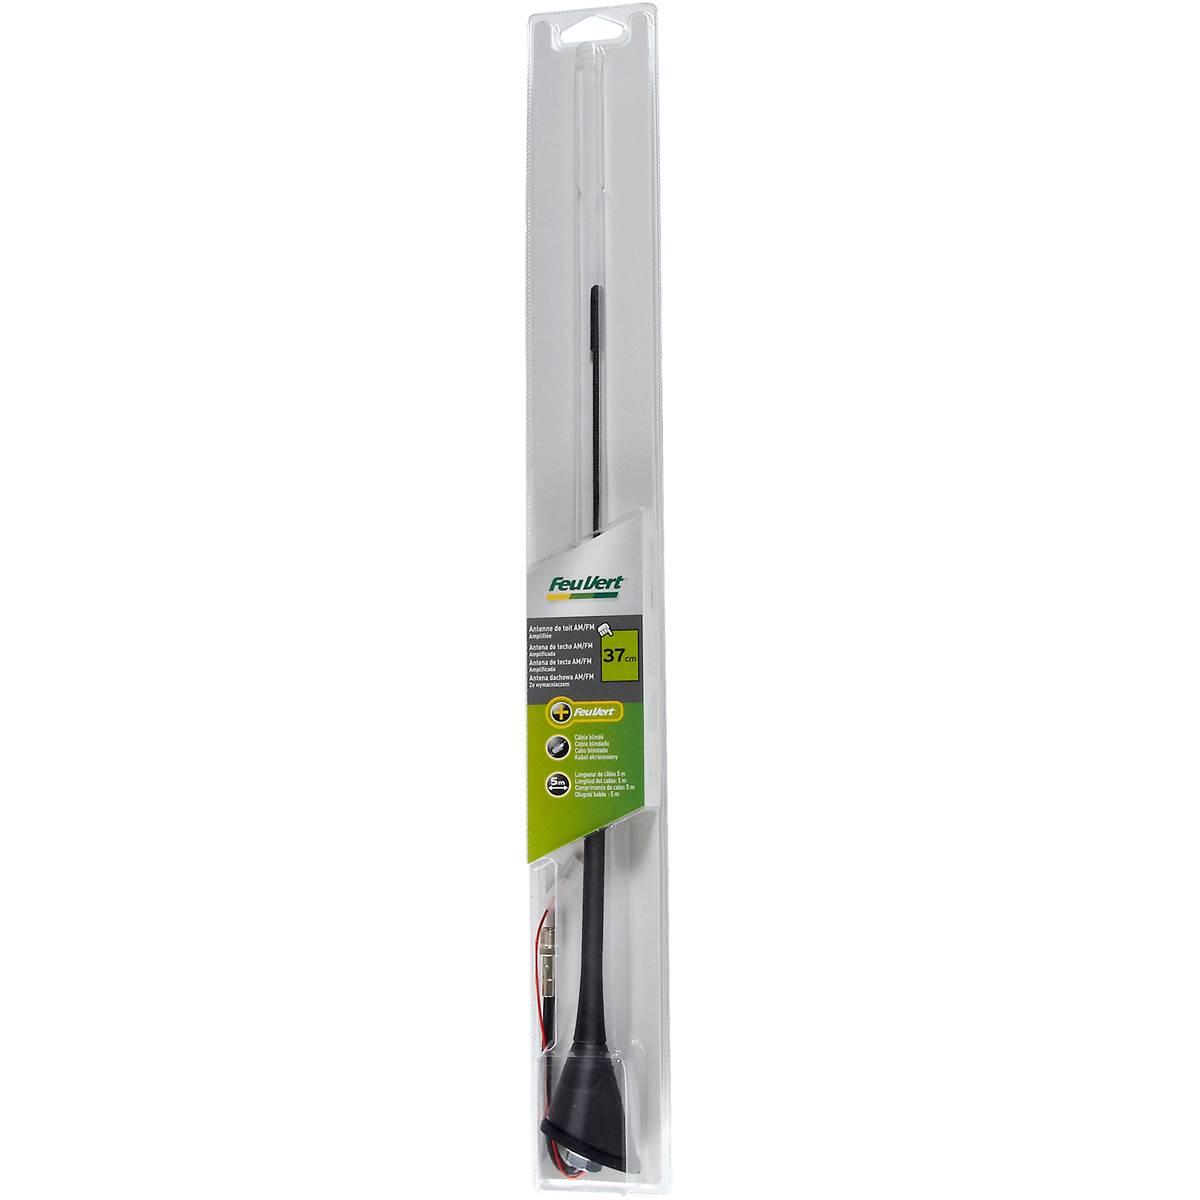 Antenne Feu Vert 37 cm + rallonge 5 m